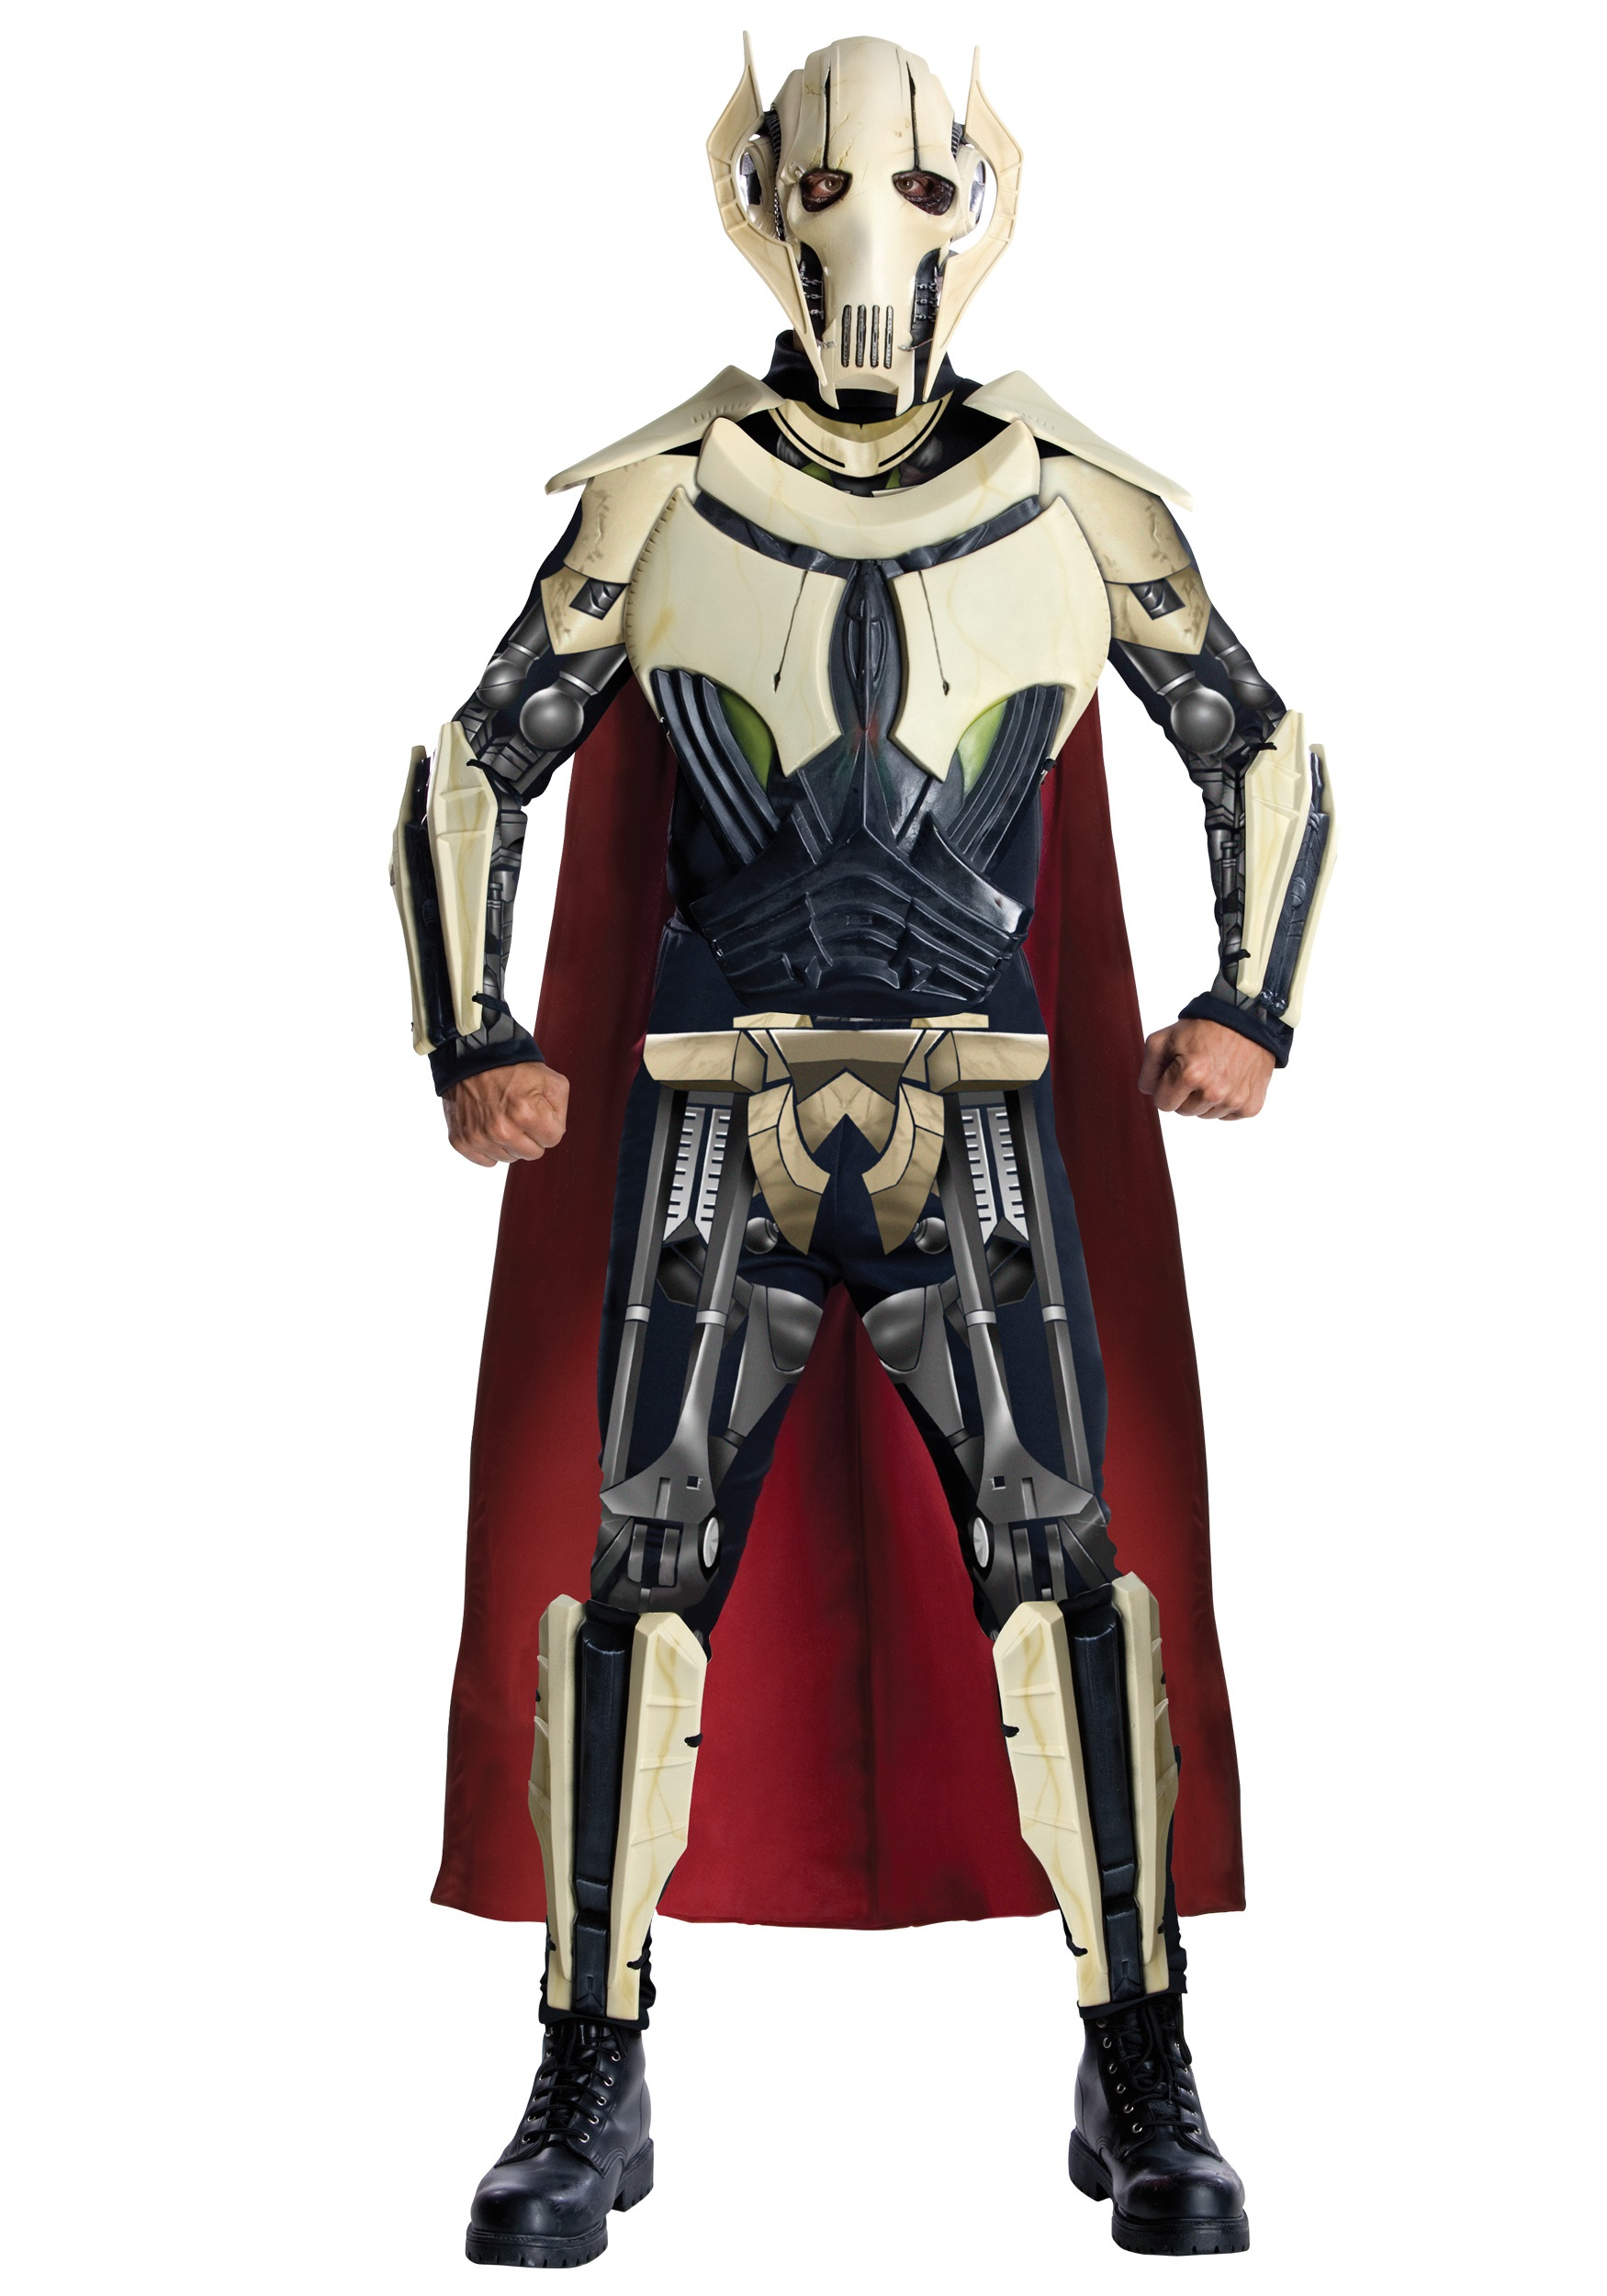 Adult Deluxe Clone Wars General Grievous Costume  sc 1 st  Halloween Costume & Adult Deluxe Clone Wars General Grievous Costume - Mens Star Wars ...